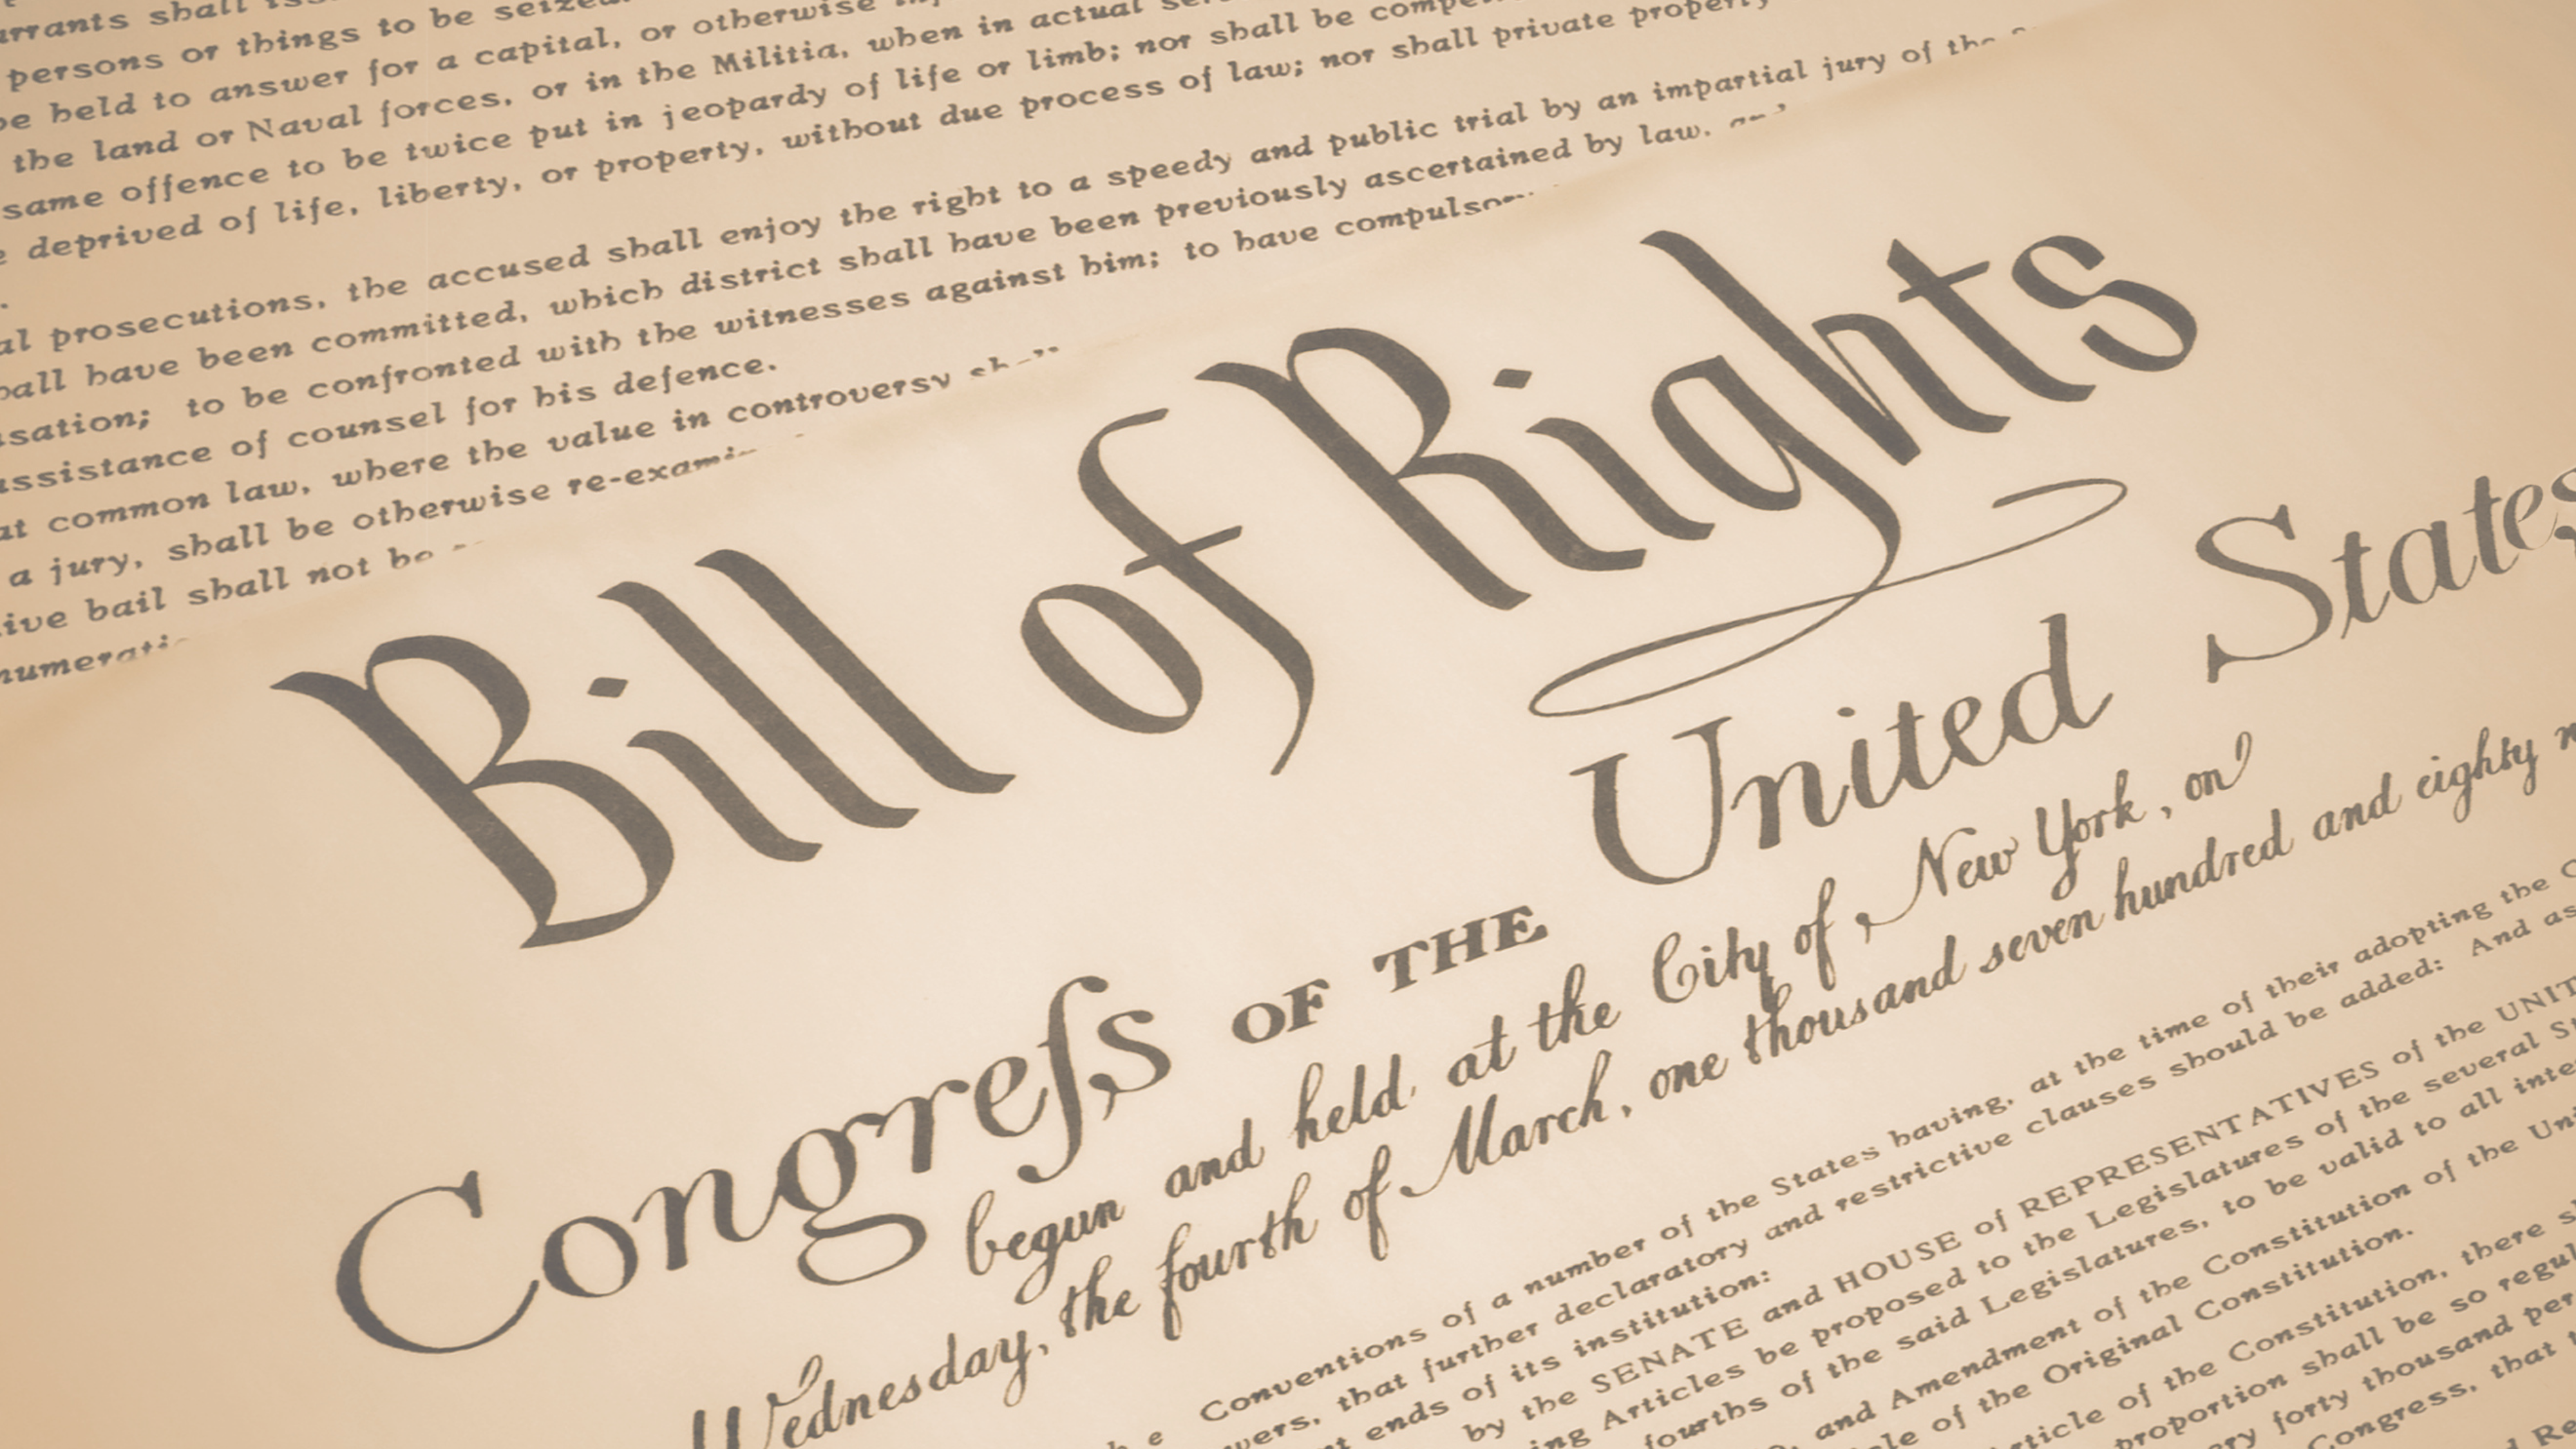 Bill of Rights (1791) - Bill of Rights Institute